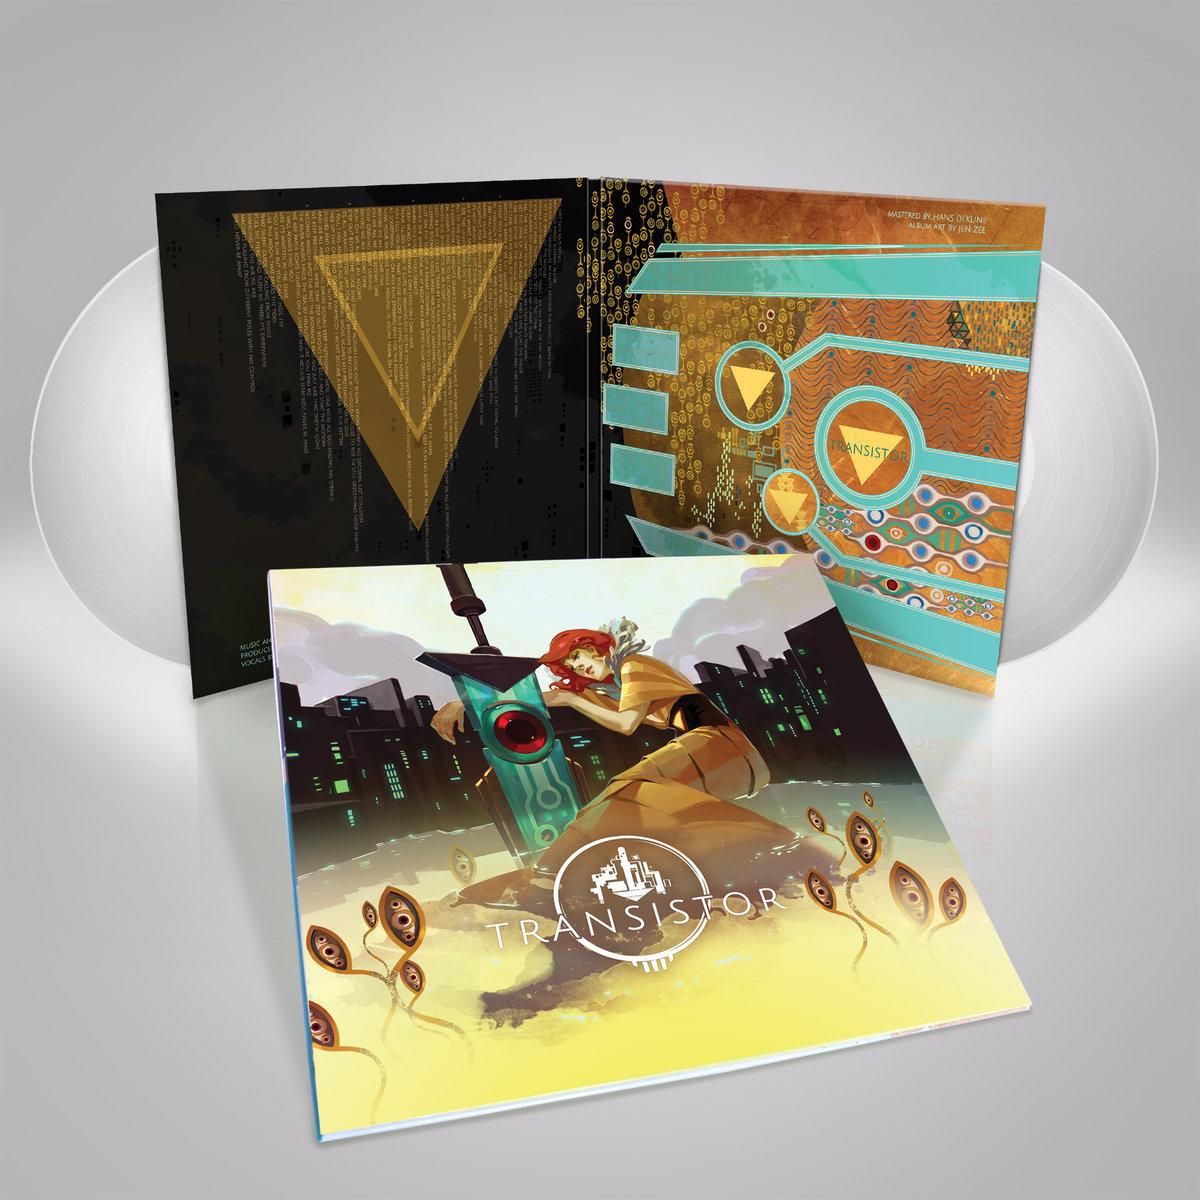 Fabulous Transistor: Original Soundtrack   Supergiant Games RD07